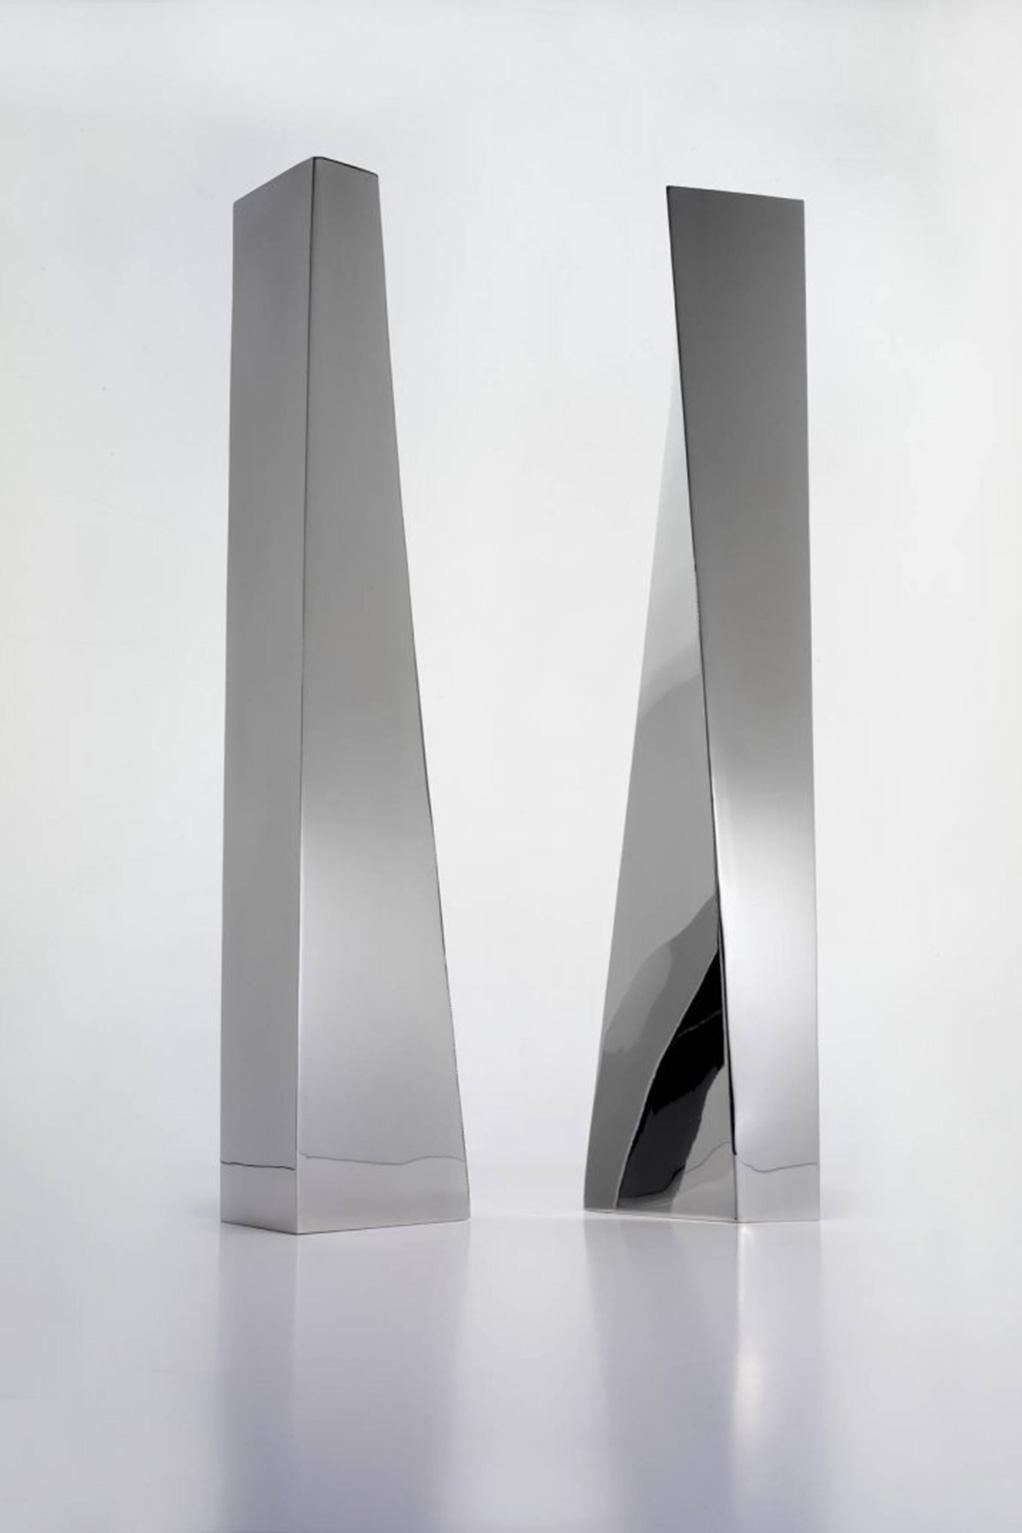 Crevasse Vase by Zaha Hadid for Alessi